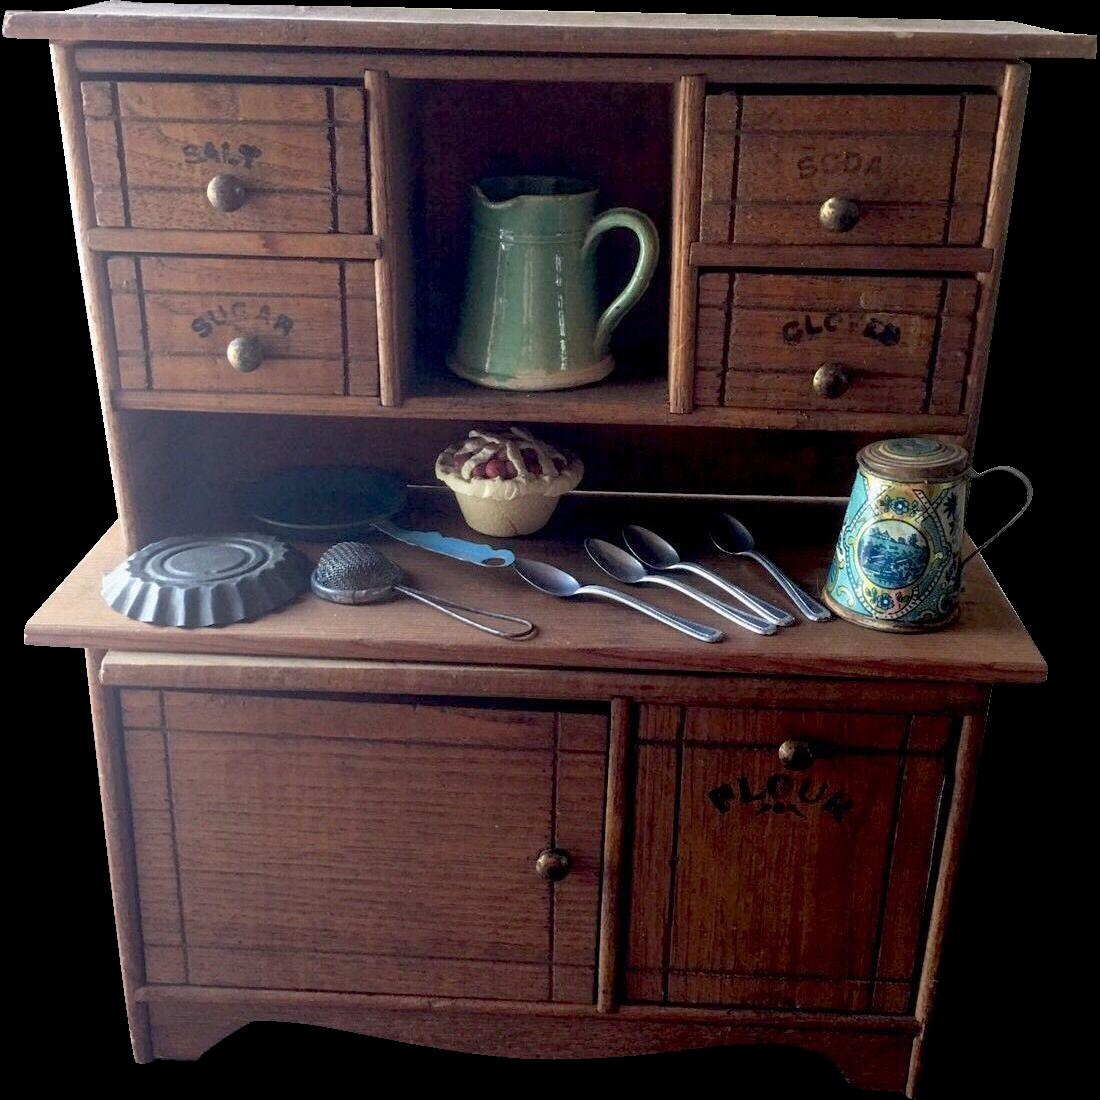 Oak Kitchen Cabinets For Sale: Oak Antique Doll Cass Kitchen Stepback Miniature Cabinet